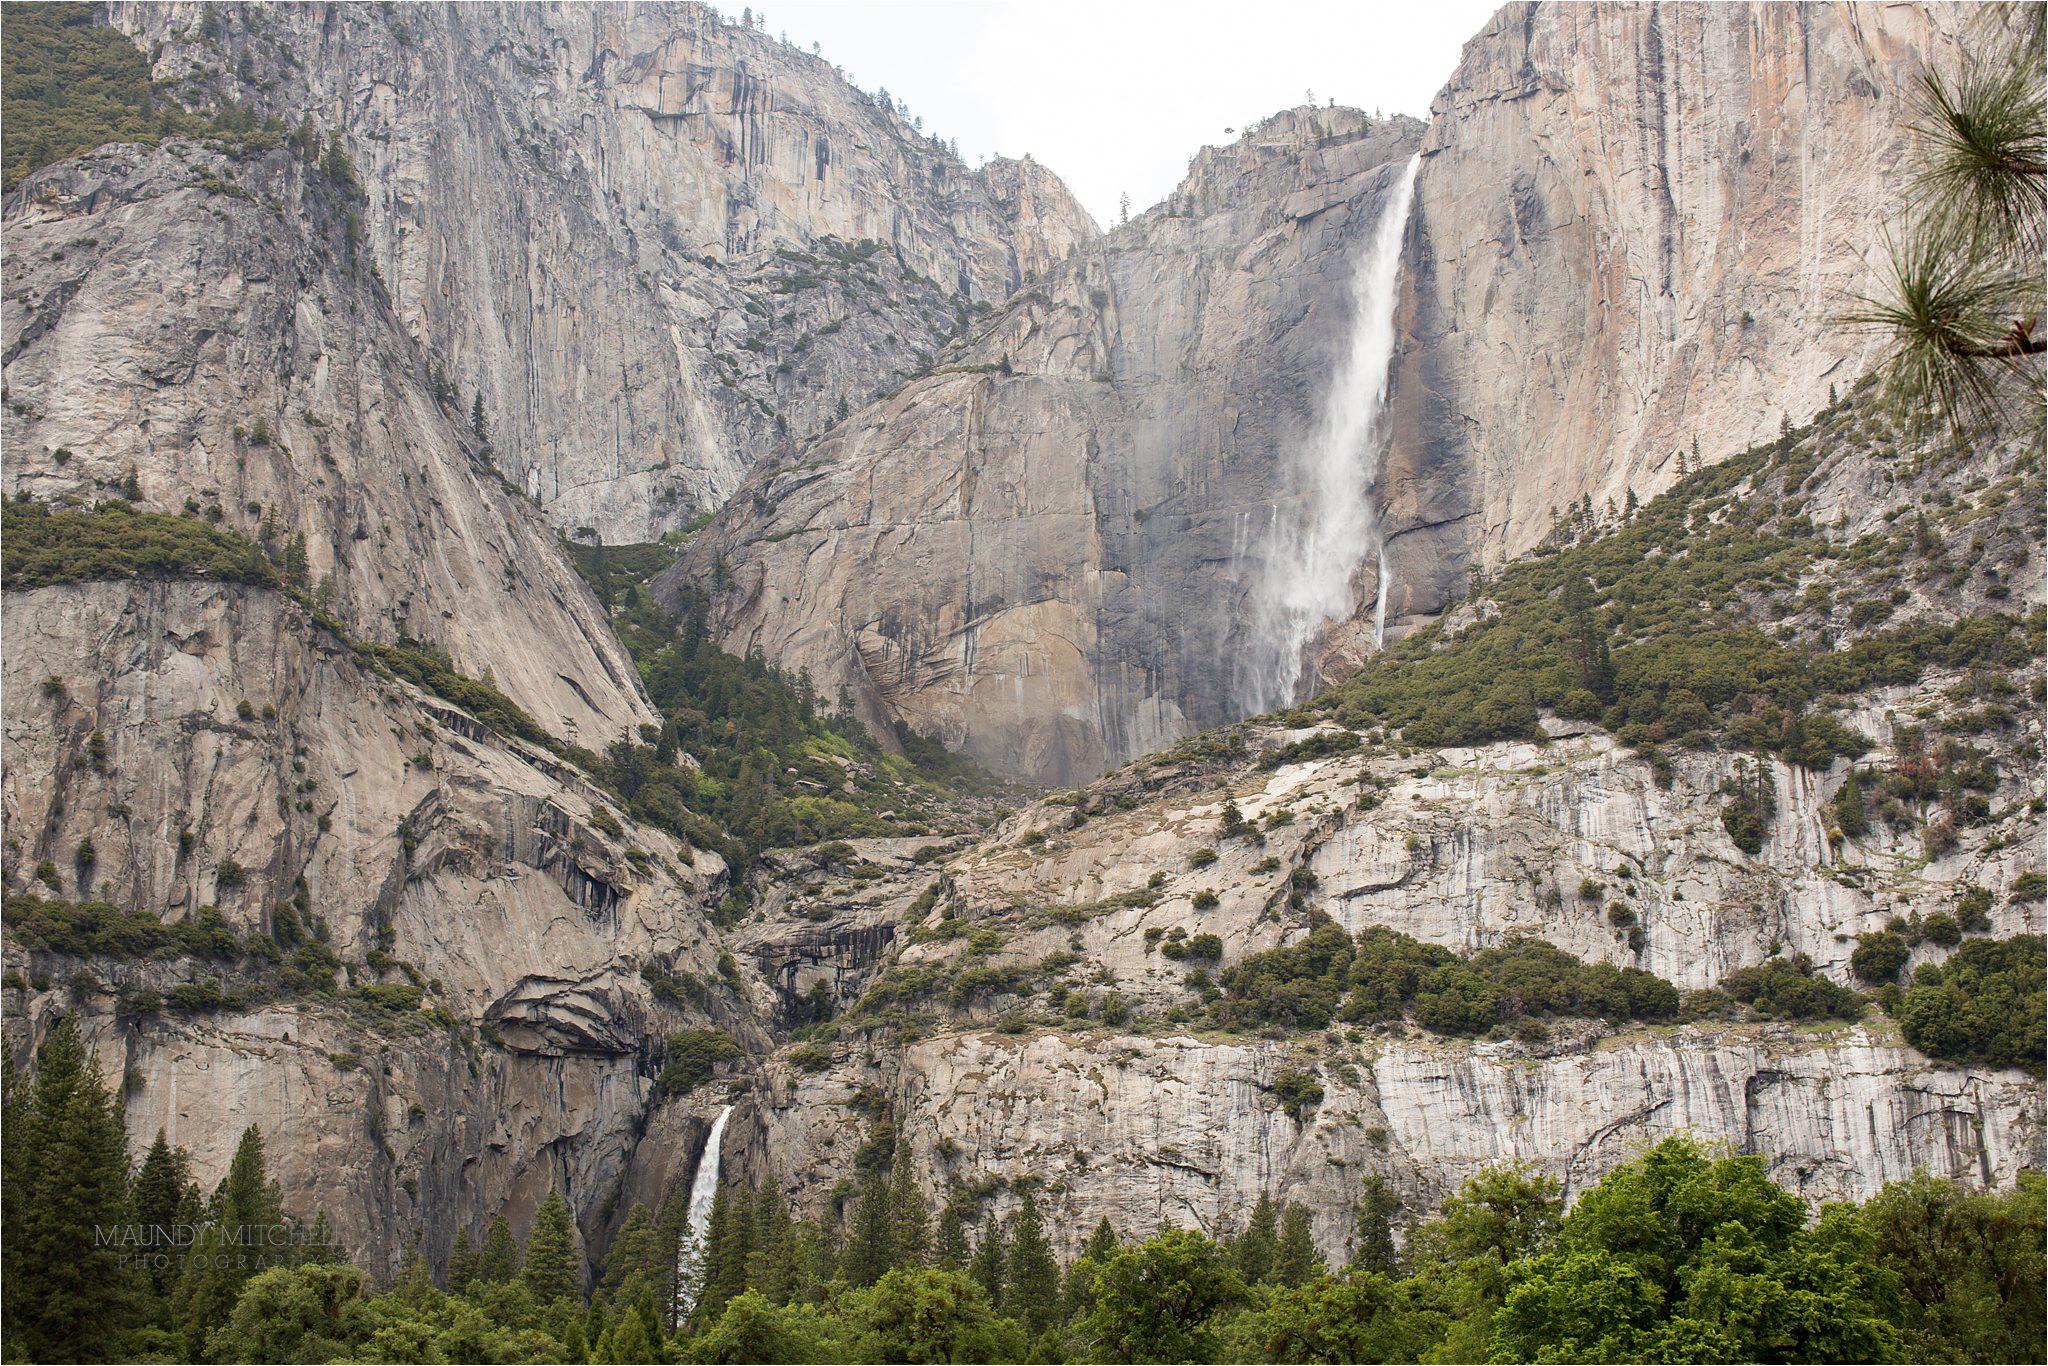 Waterfalls in Yosemite National Park